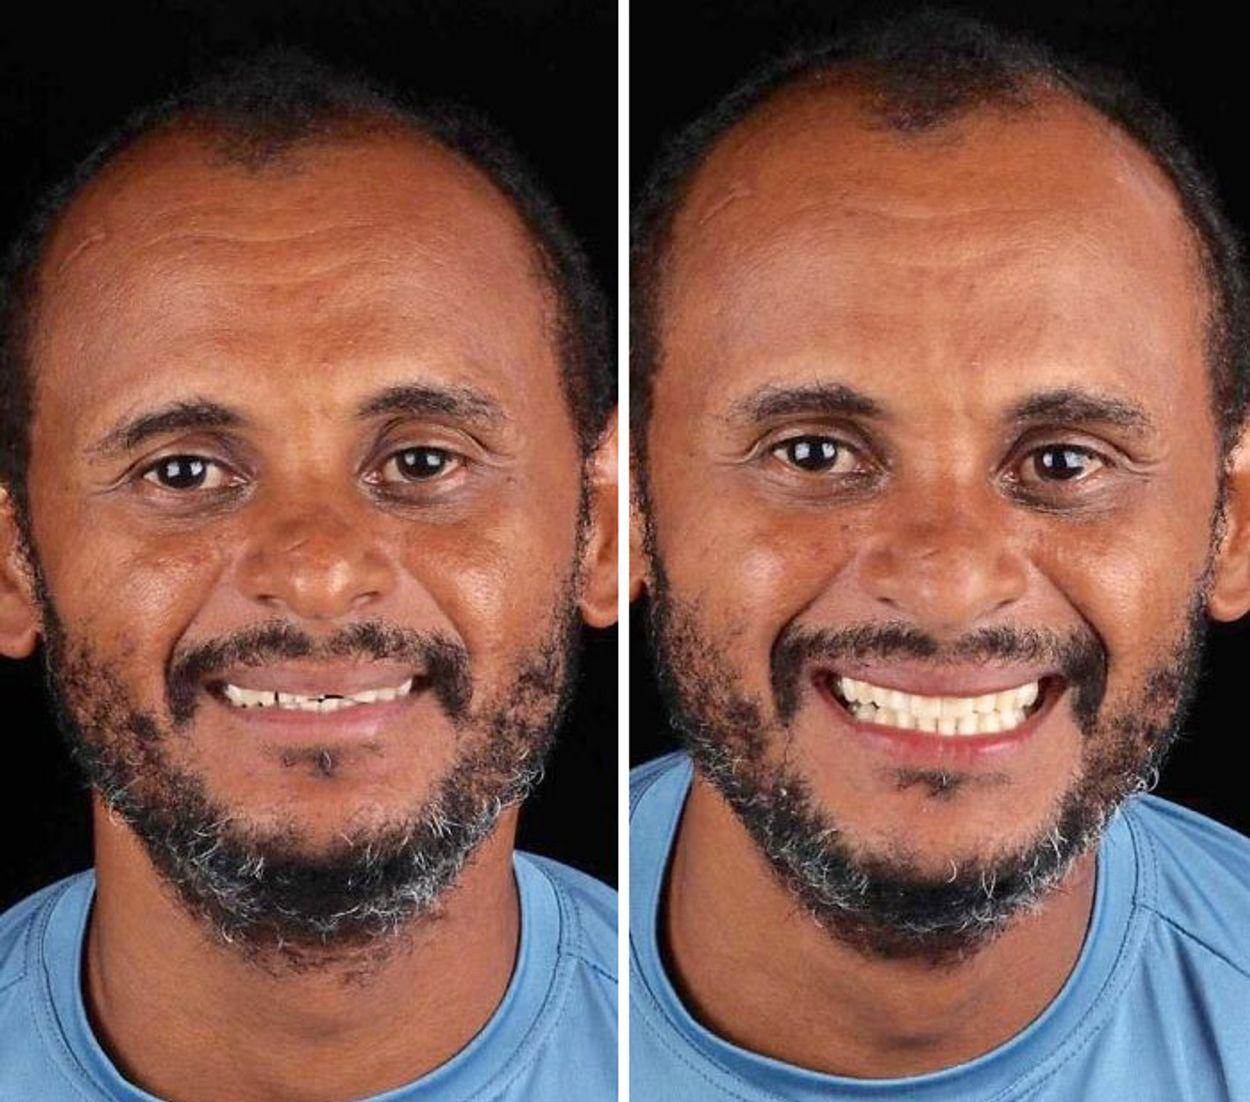 brazilian-dentist-travel-poor-people-teeth-fix-felipe-rossi-54-5db95680bbdbf__700